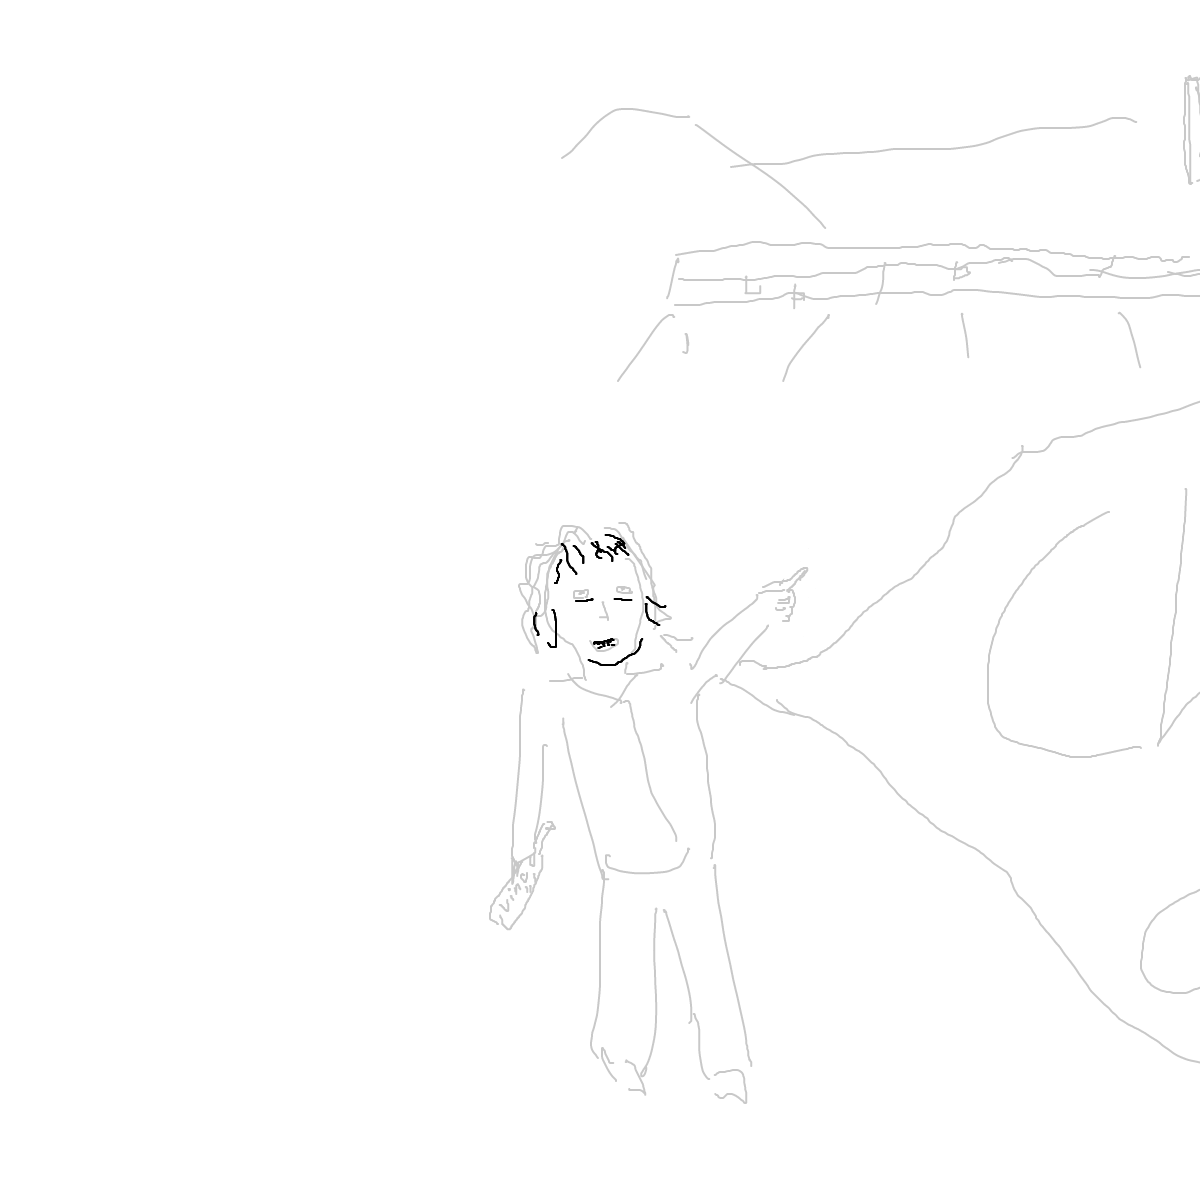 BAAAM drawing#9331 lat:41.7283744812011700lng: 13.2908277511596680